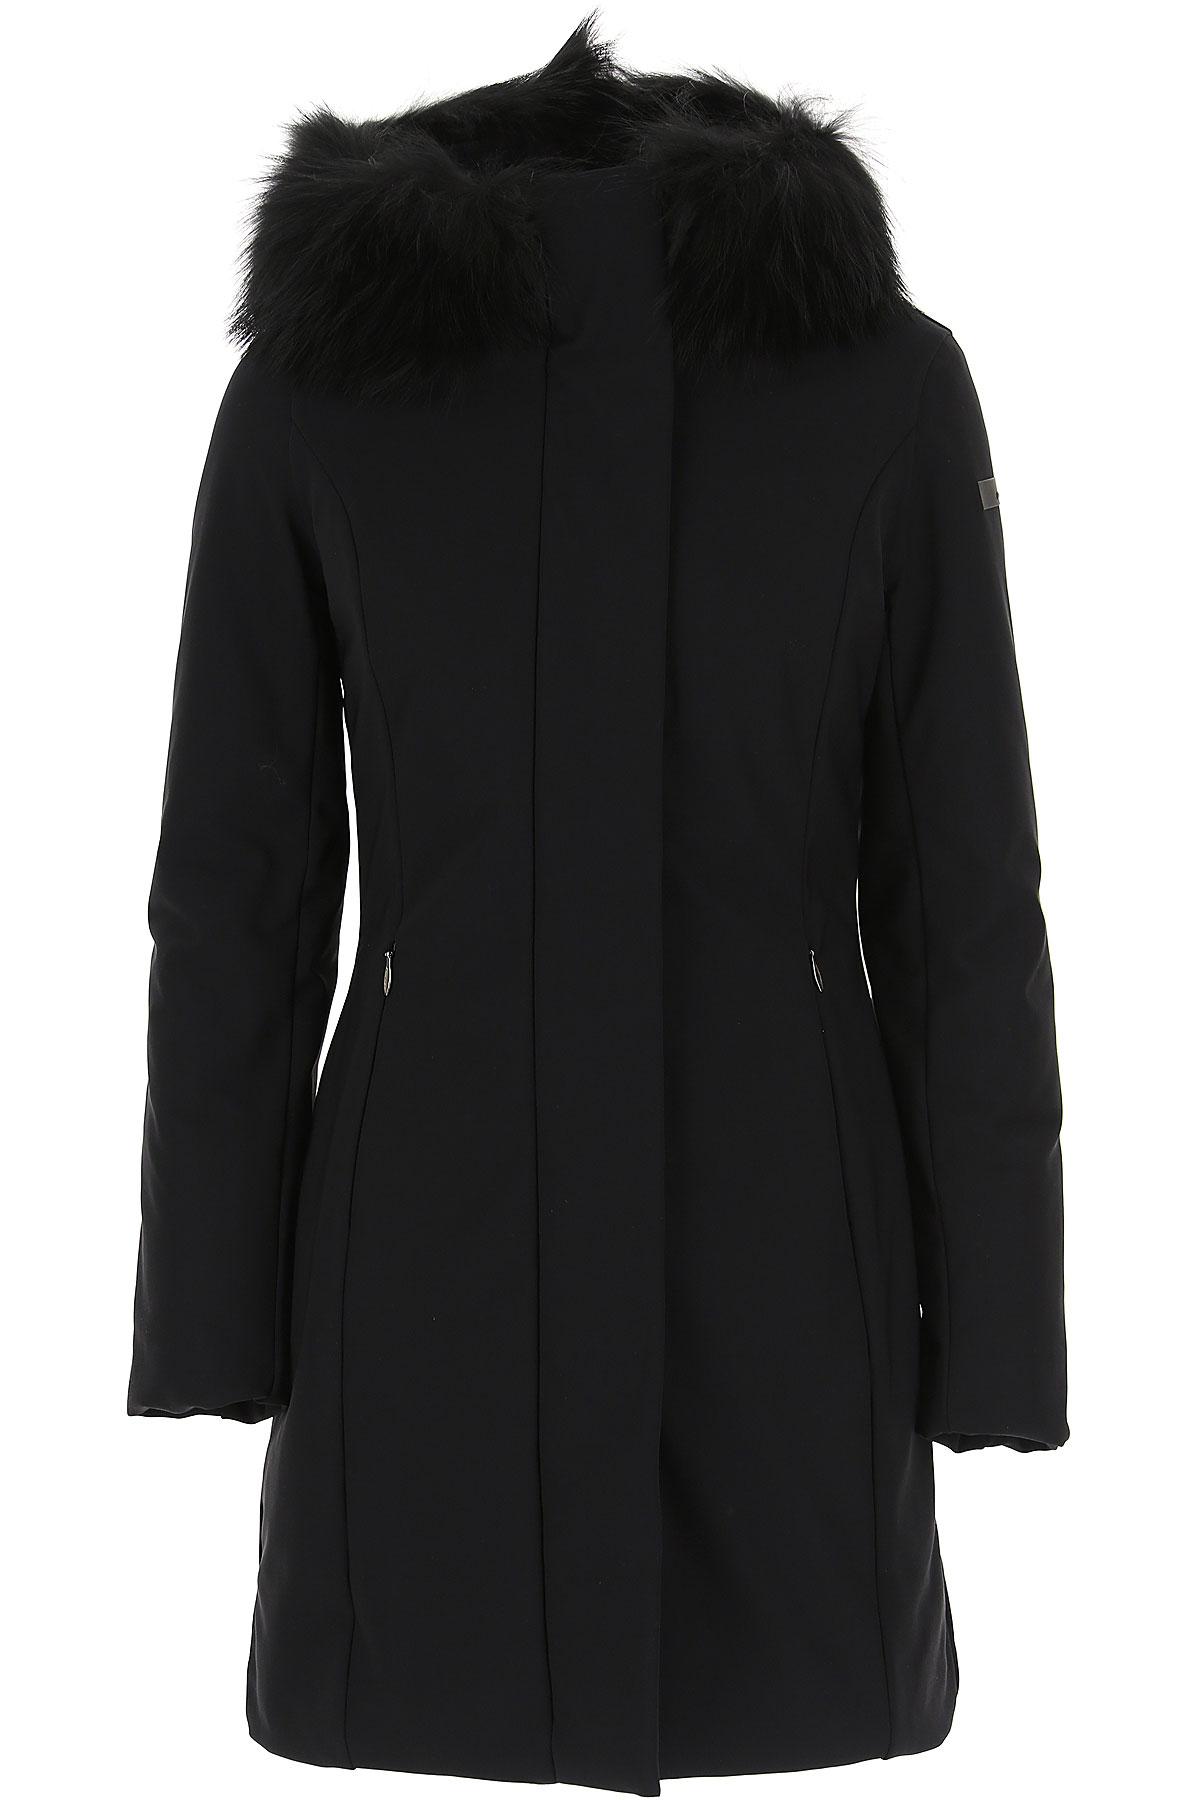 RRD Jacket for Women On Sale, Black, polyamide, 2019, 10 14 2 4 6 8